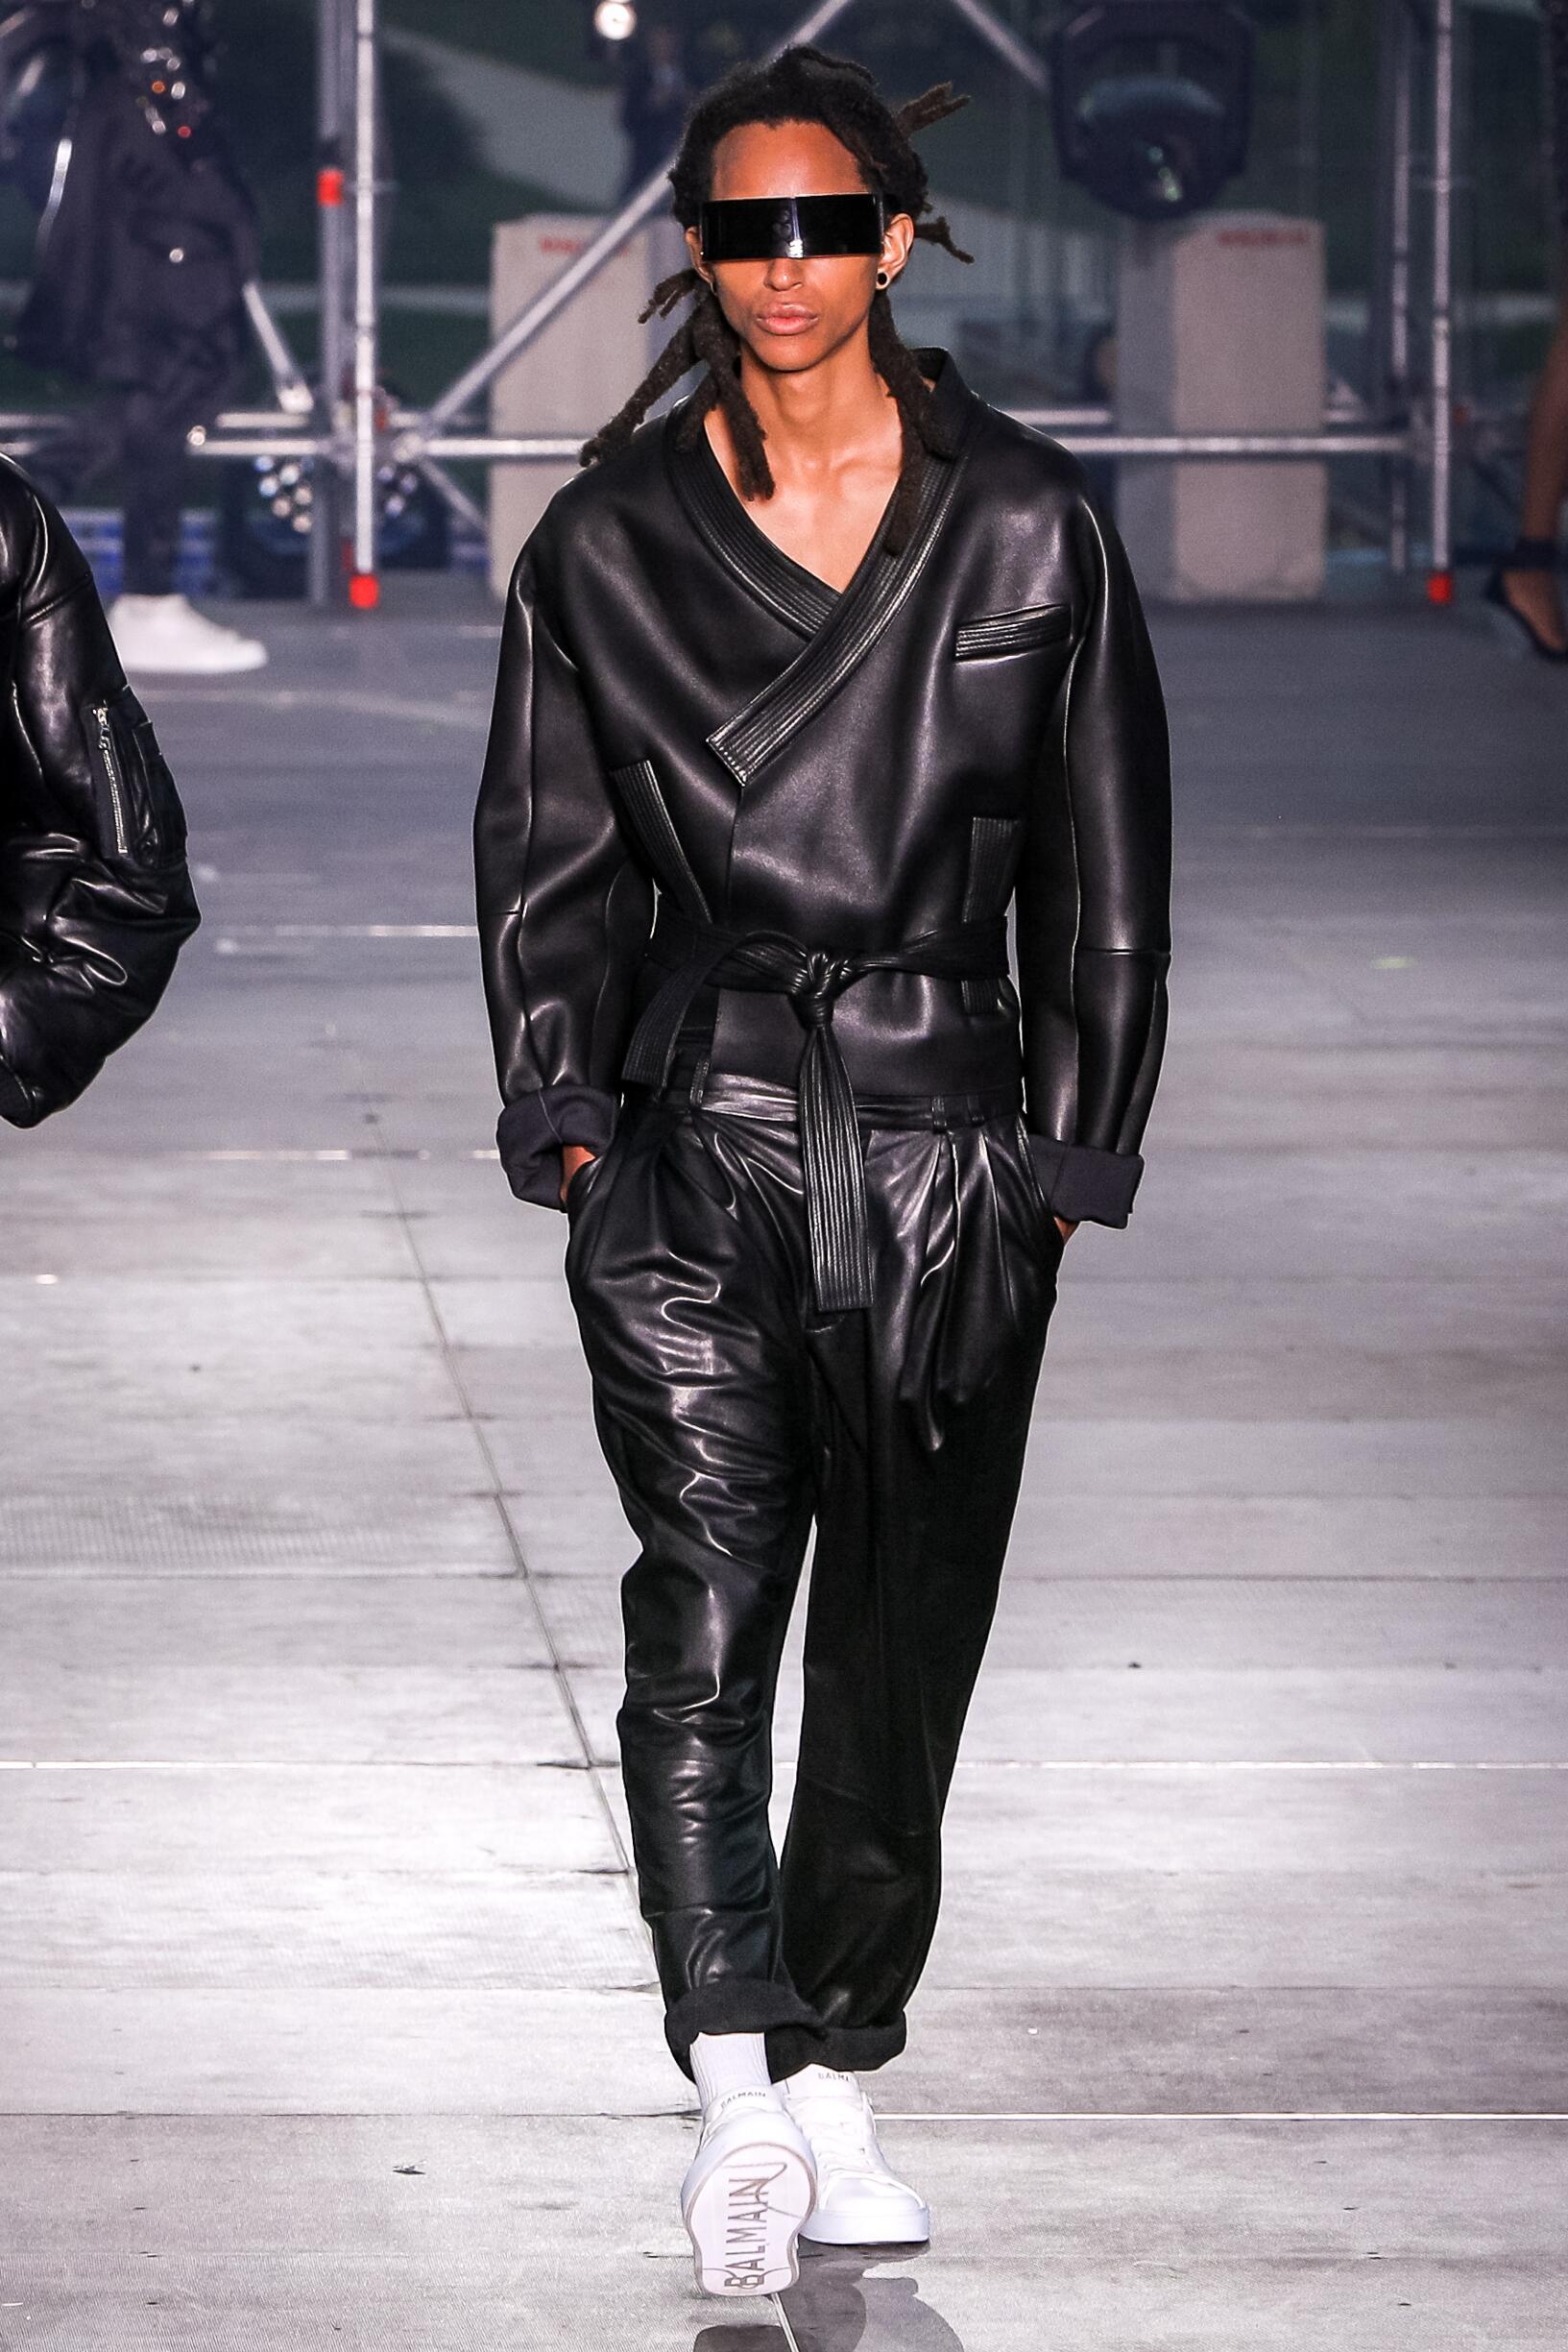 Balmain Menswear Collection Trends Summer